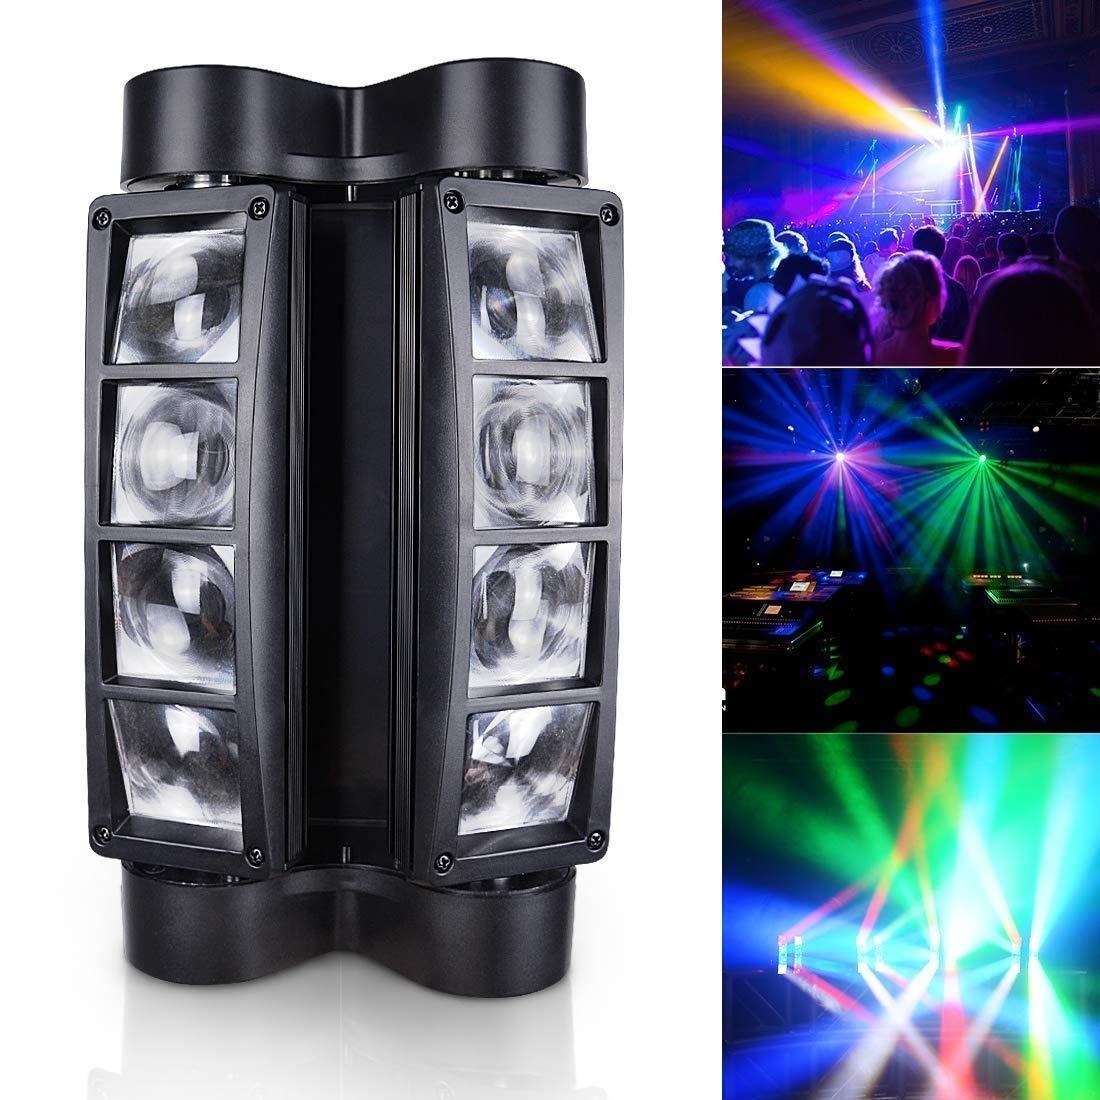 Youtree Spider Spot Moving Head Light LED DJ Lighting RGBW, 8 x 3W DMX 512 Dual Sweeper Pulse Strobe Effect, for Restaurant,Live,Concert Lighting Light